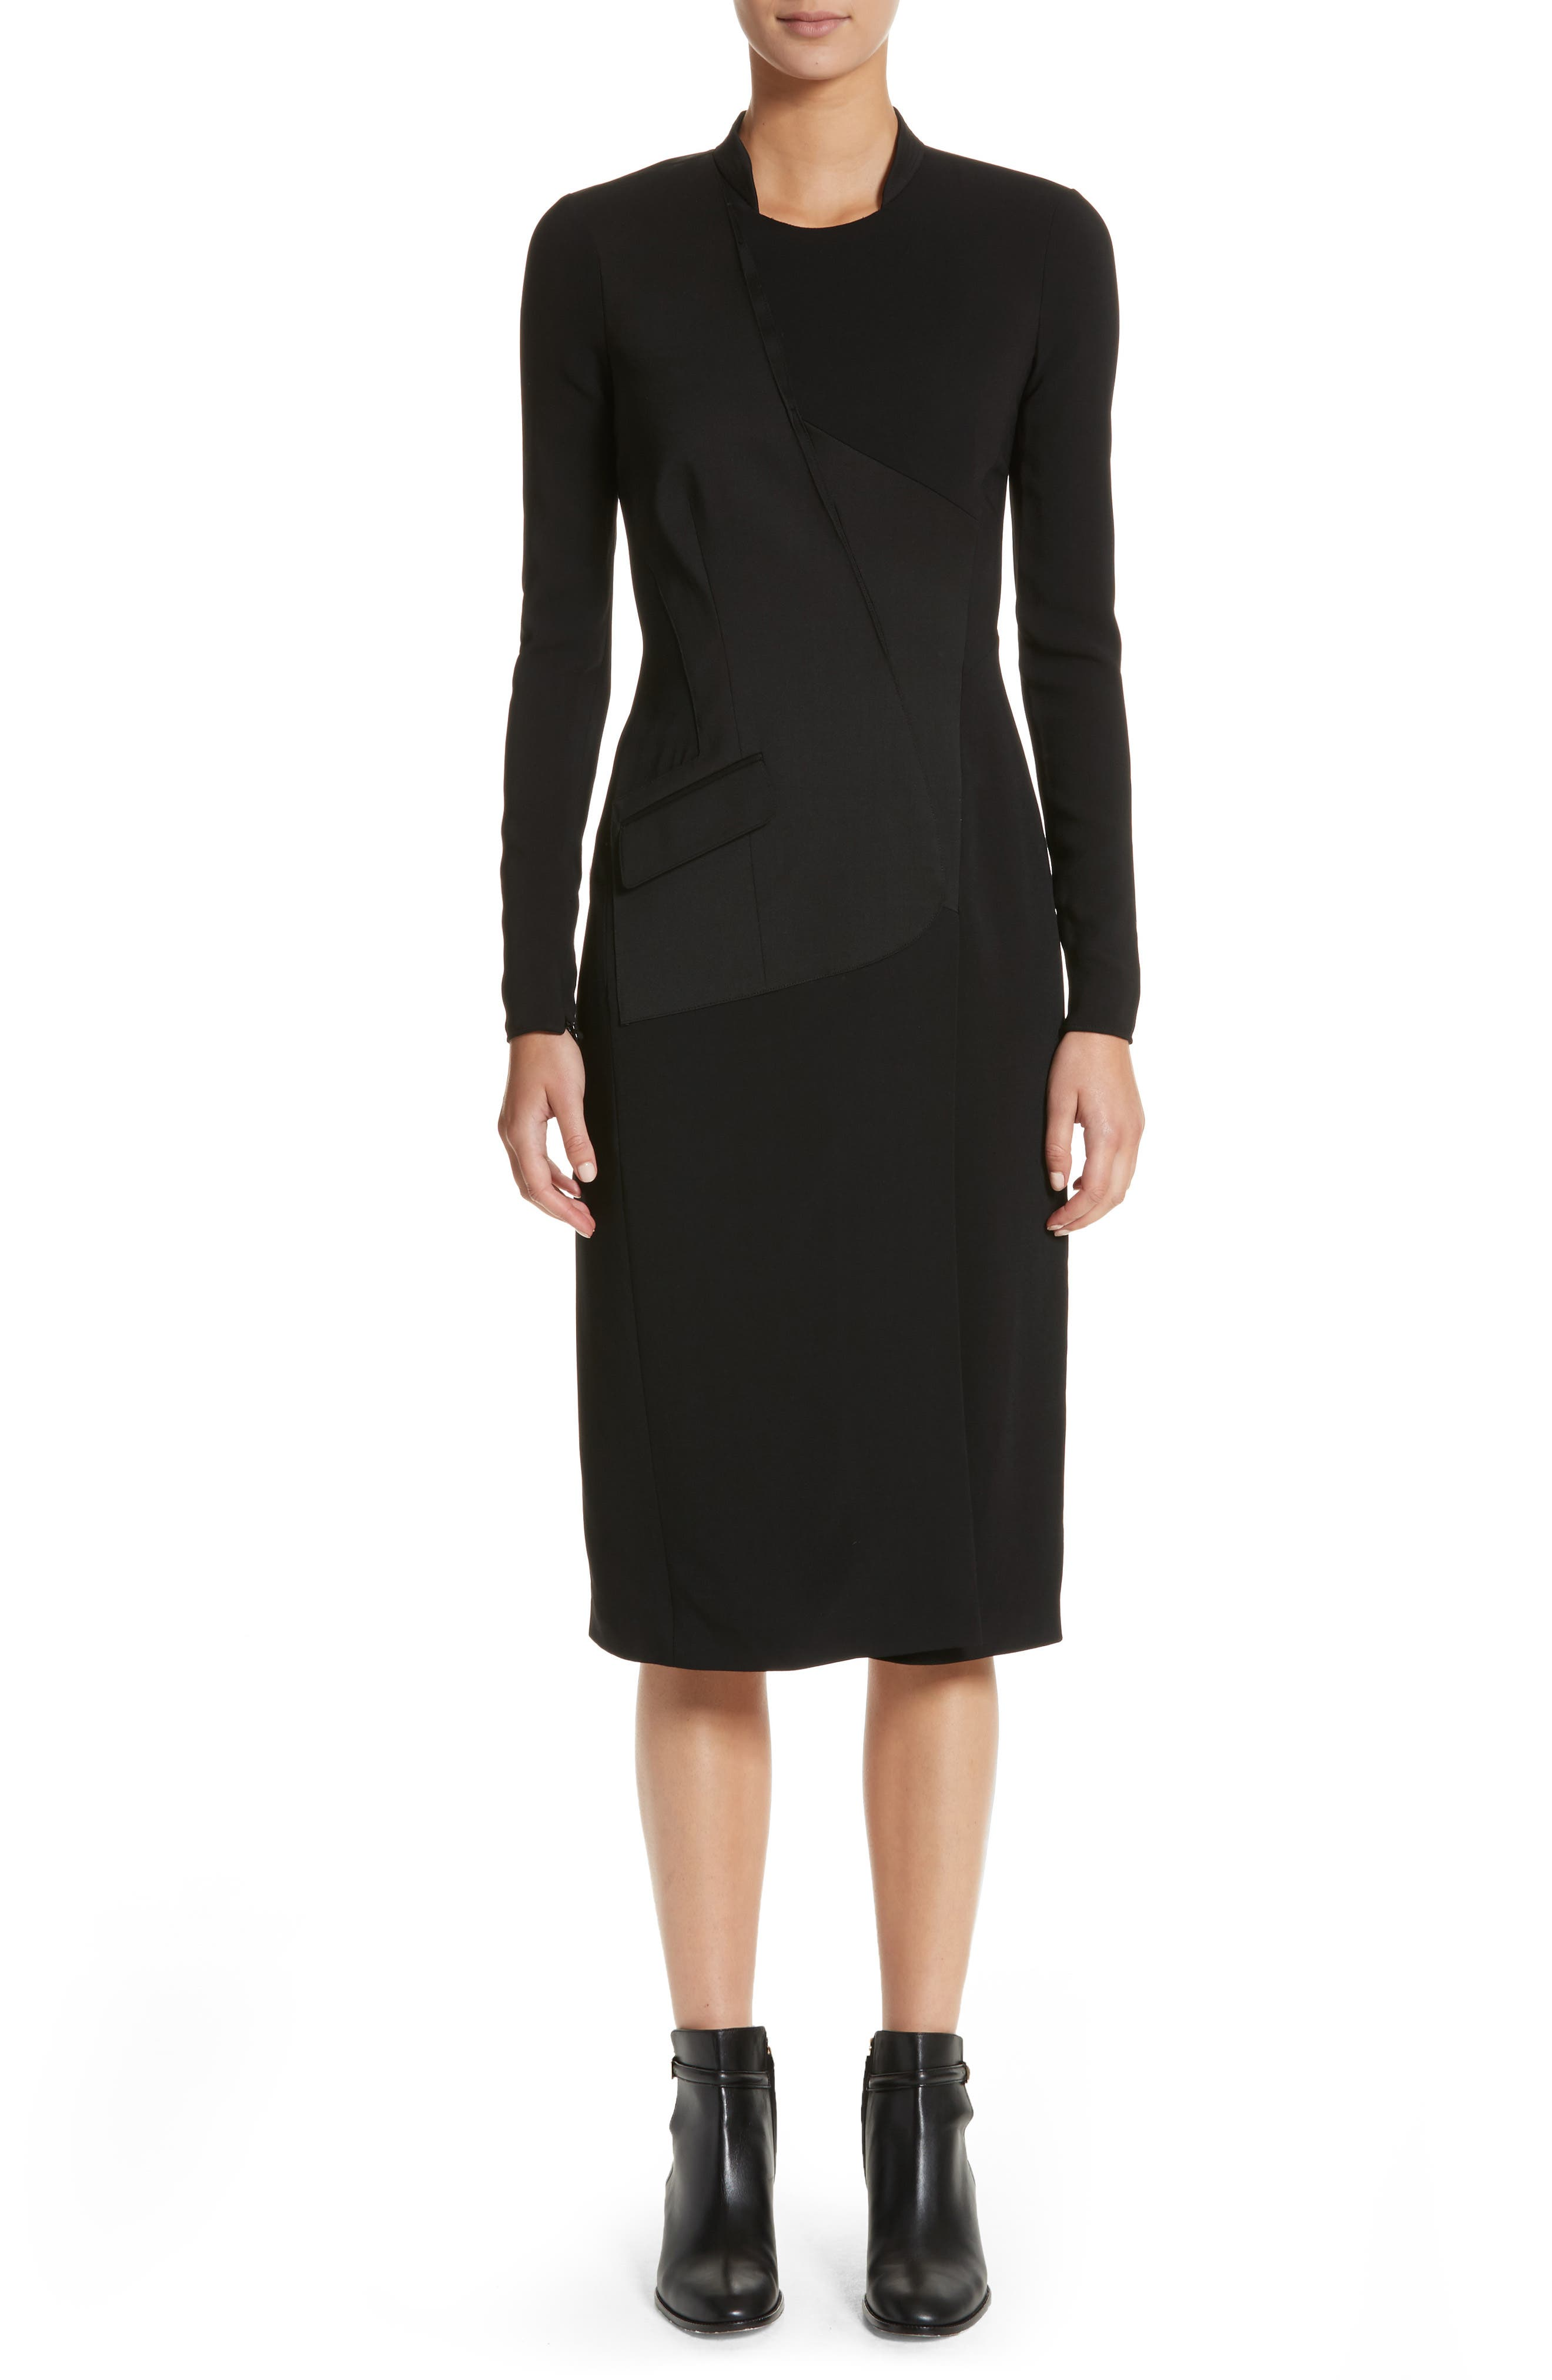 Miriam Sheath Dress,                         Main,                         color, Black